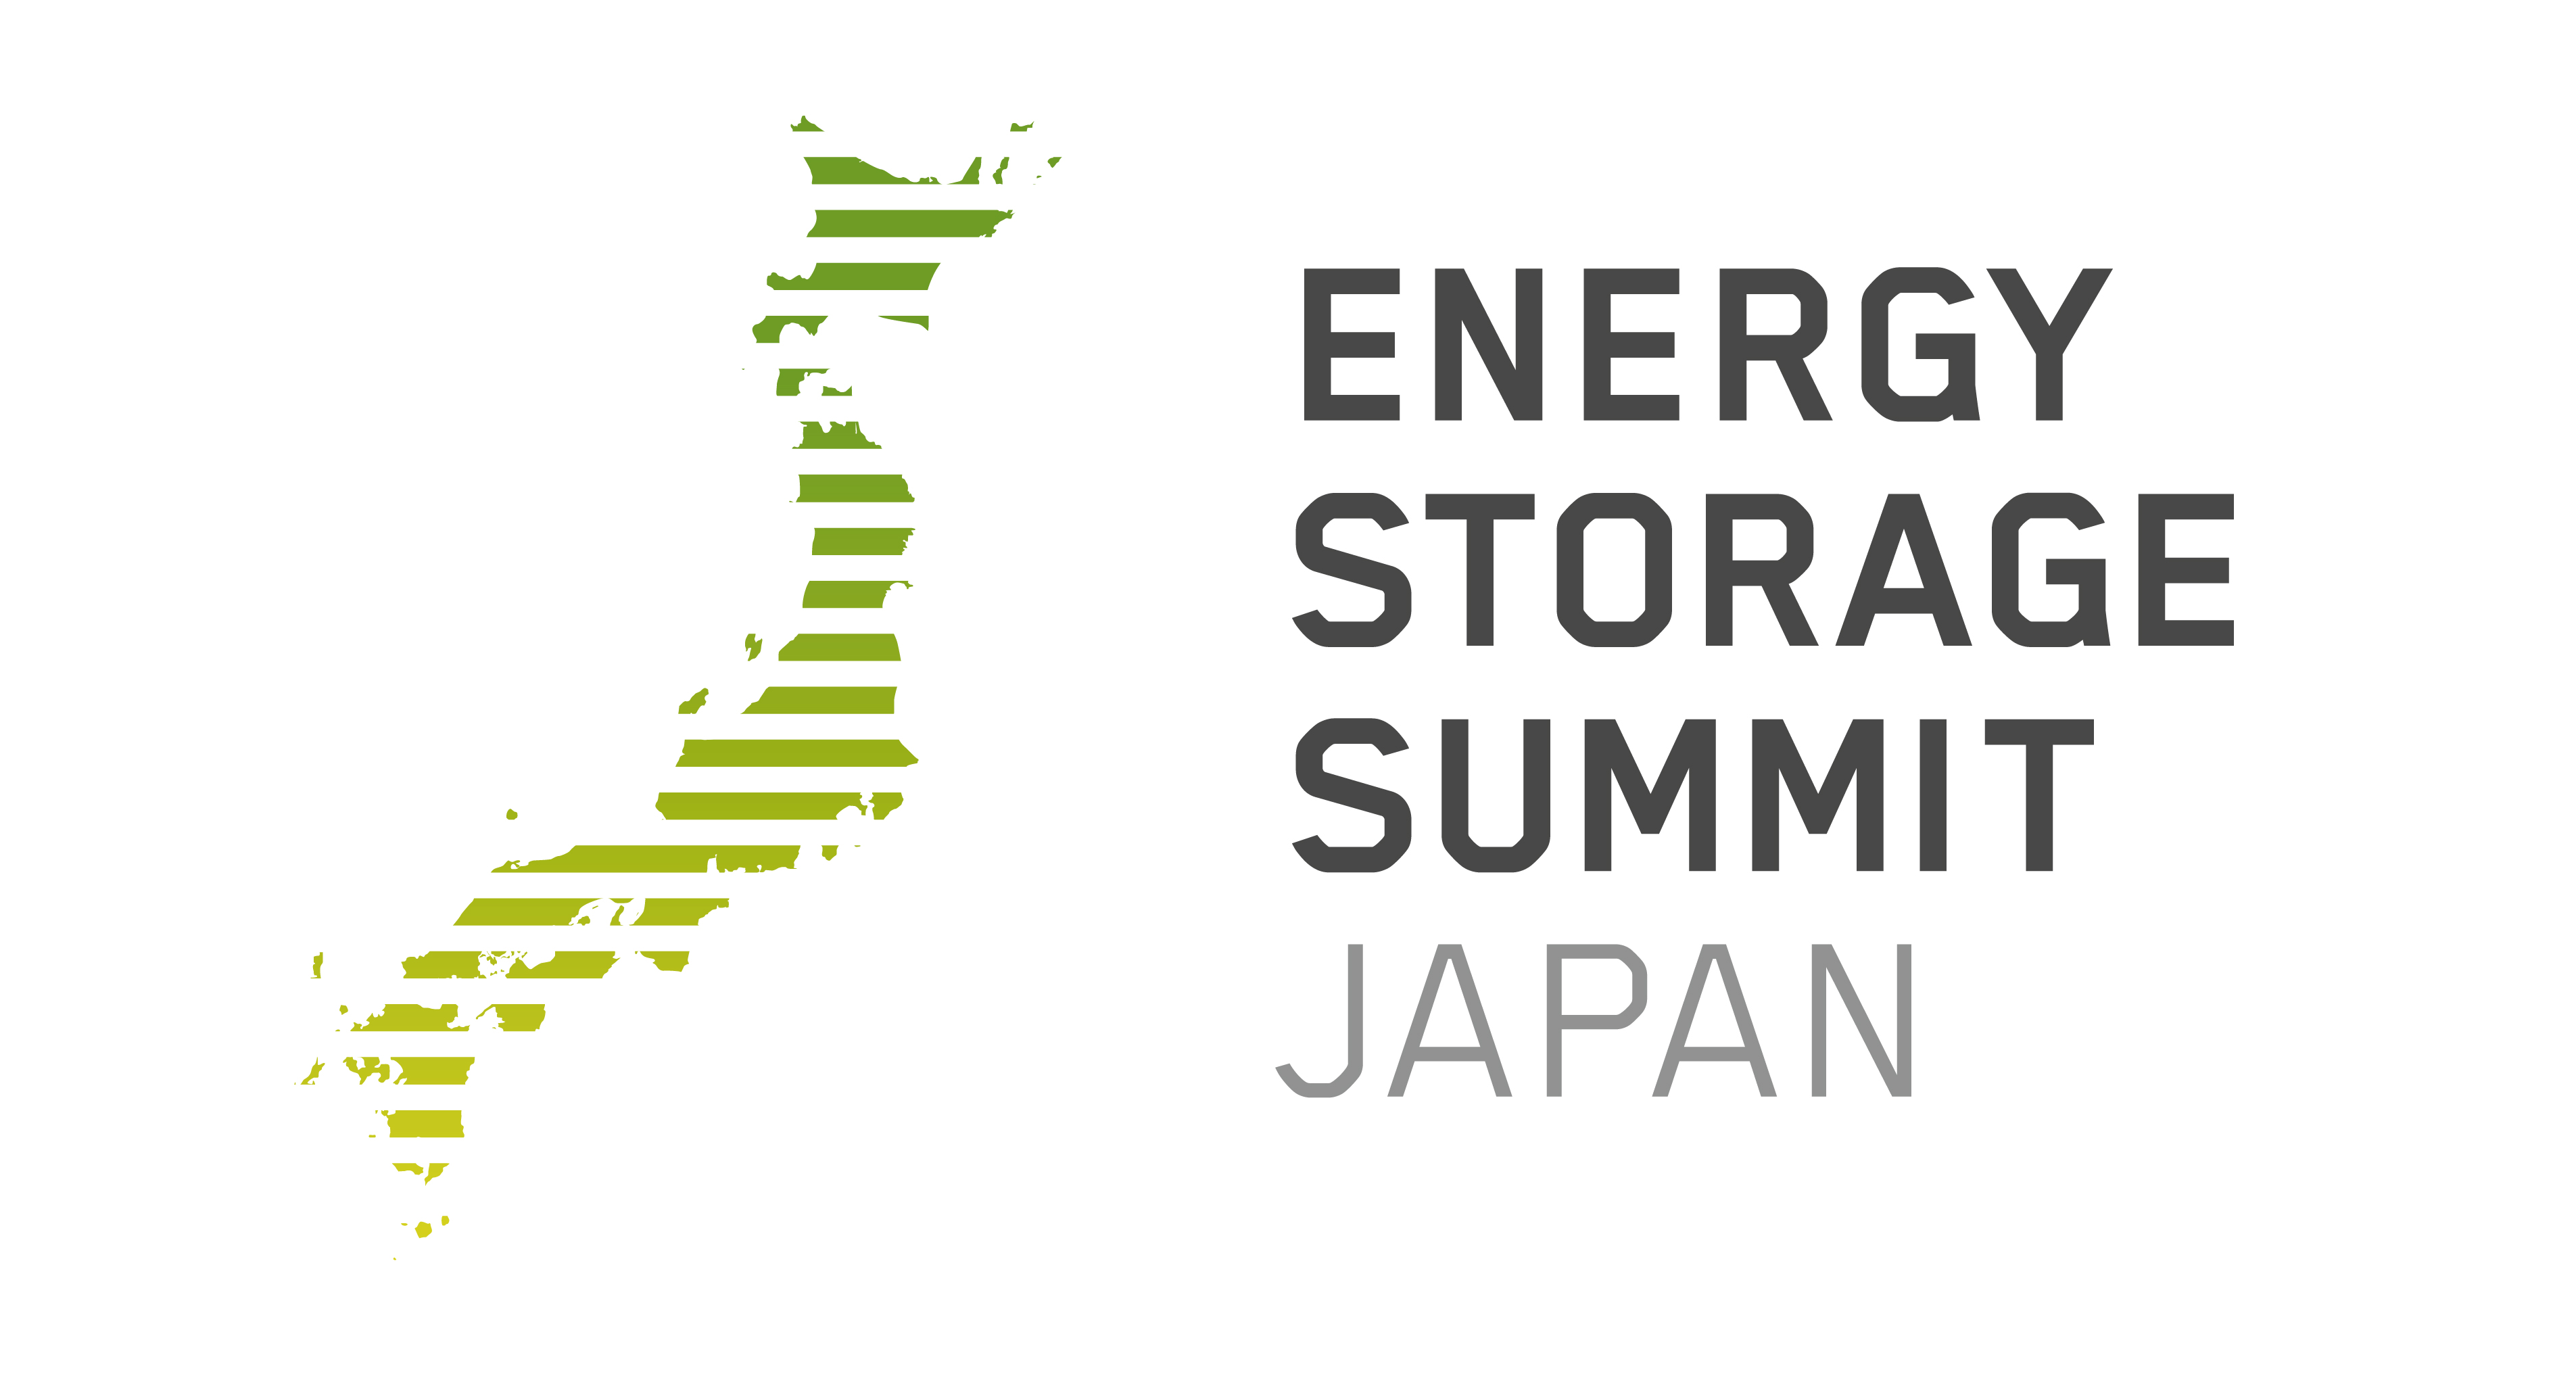 ENERGY STORAGE SUMMIT JAPAN